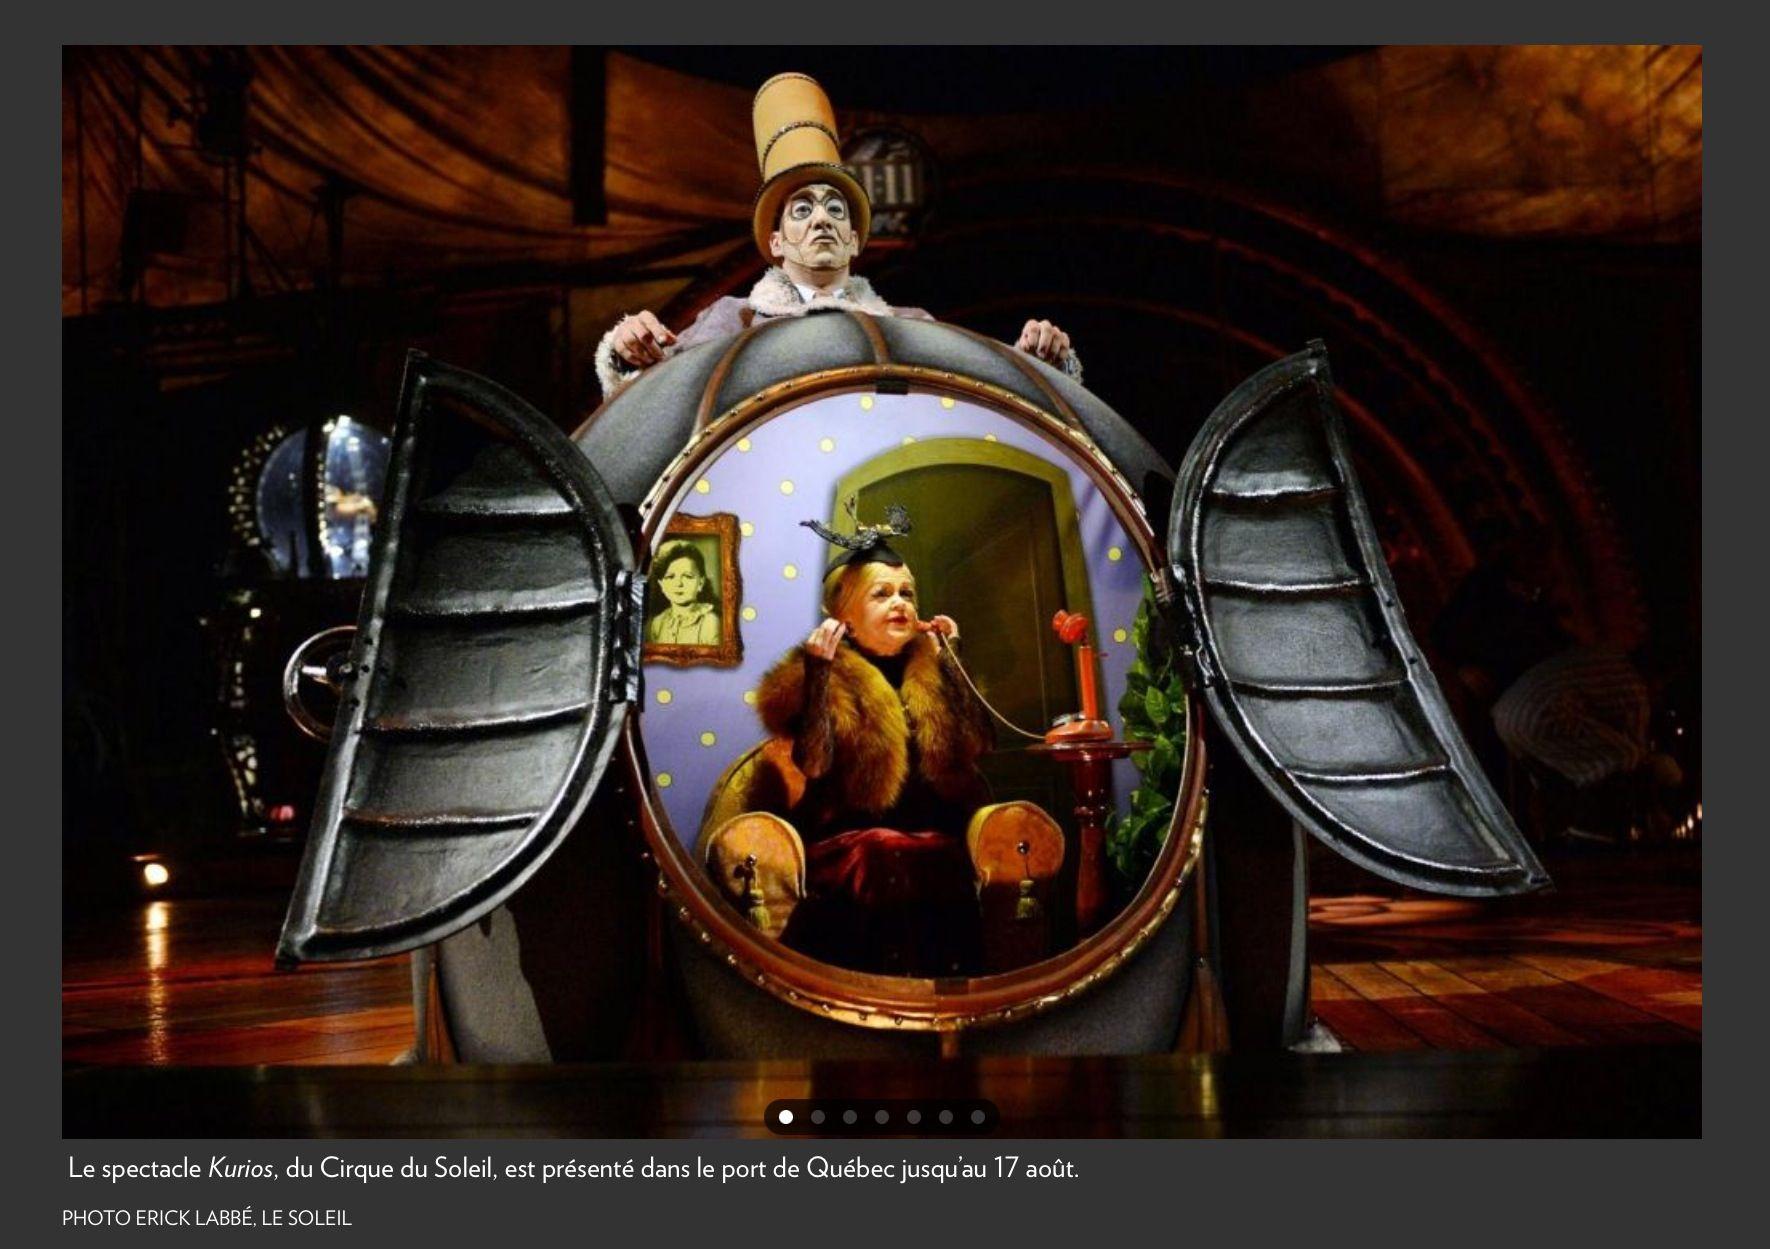 Kurios, Cabinet des curiosités, Cirque du soleil | The Creative ...